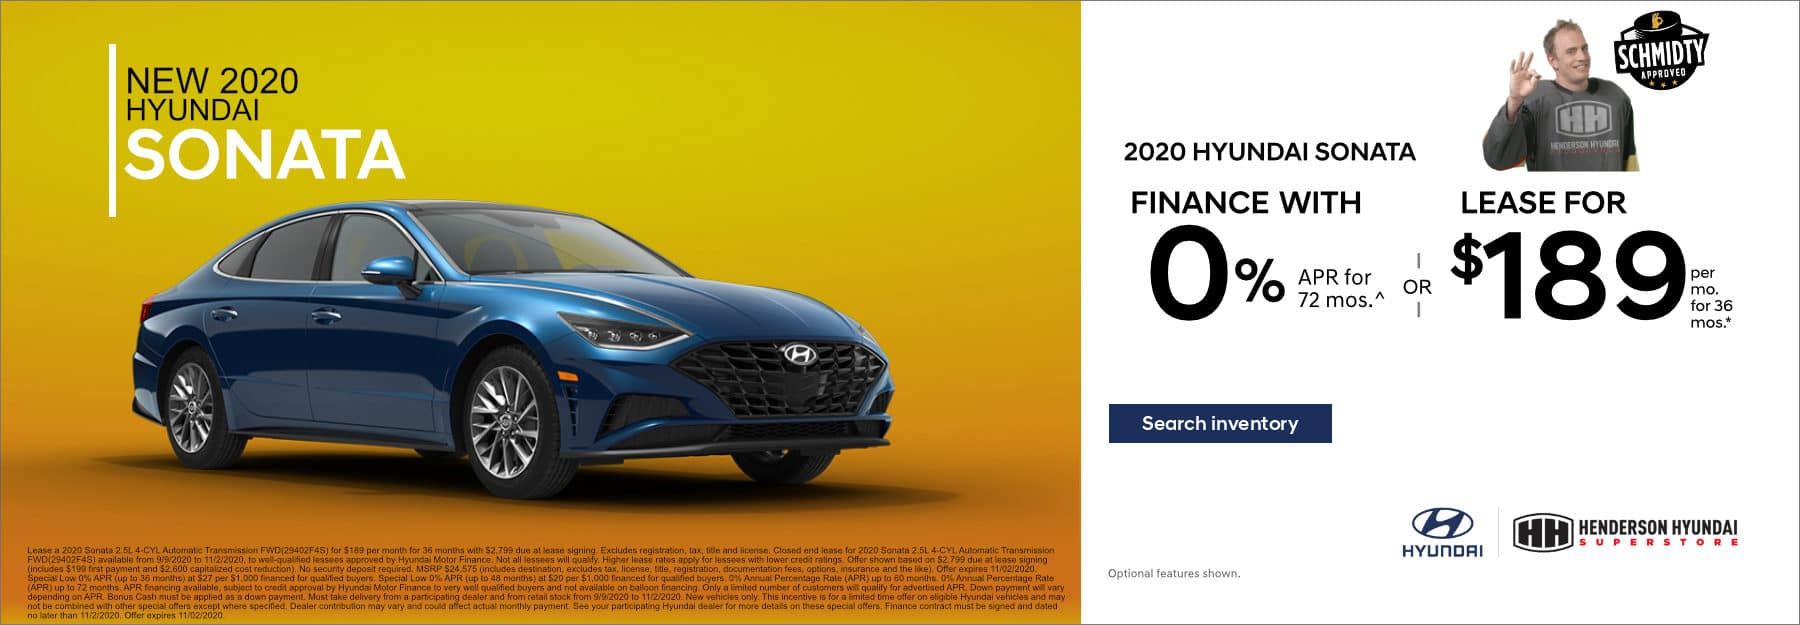 September-2020 Sonata_Henderson_Hyundai_1400x514